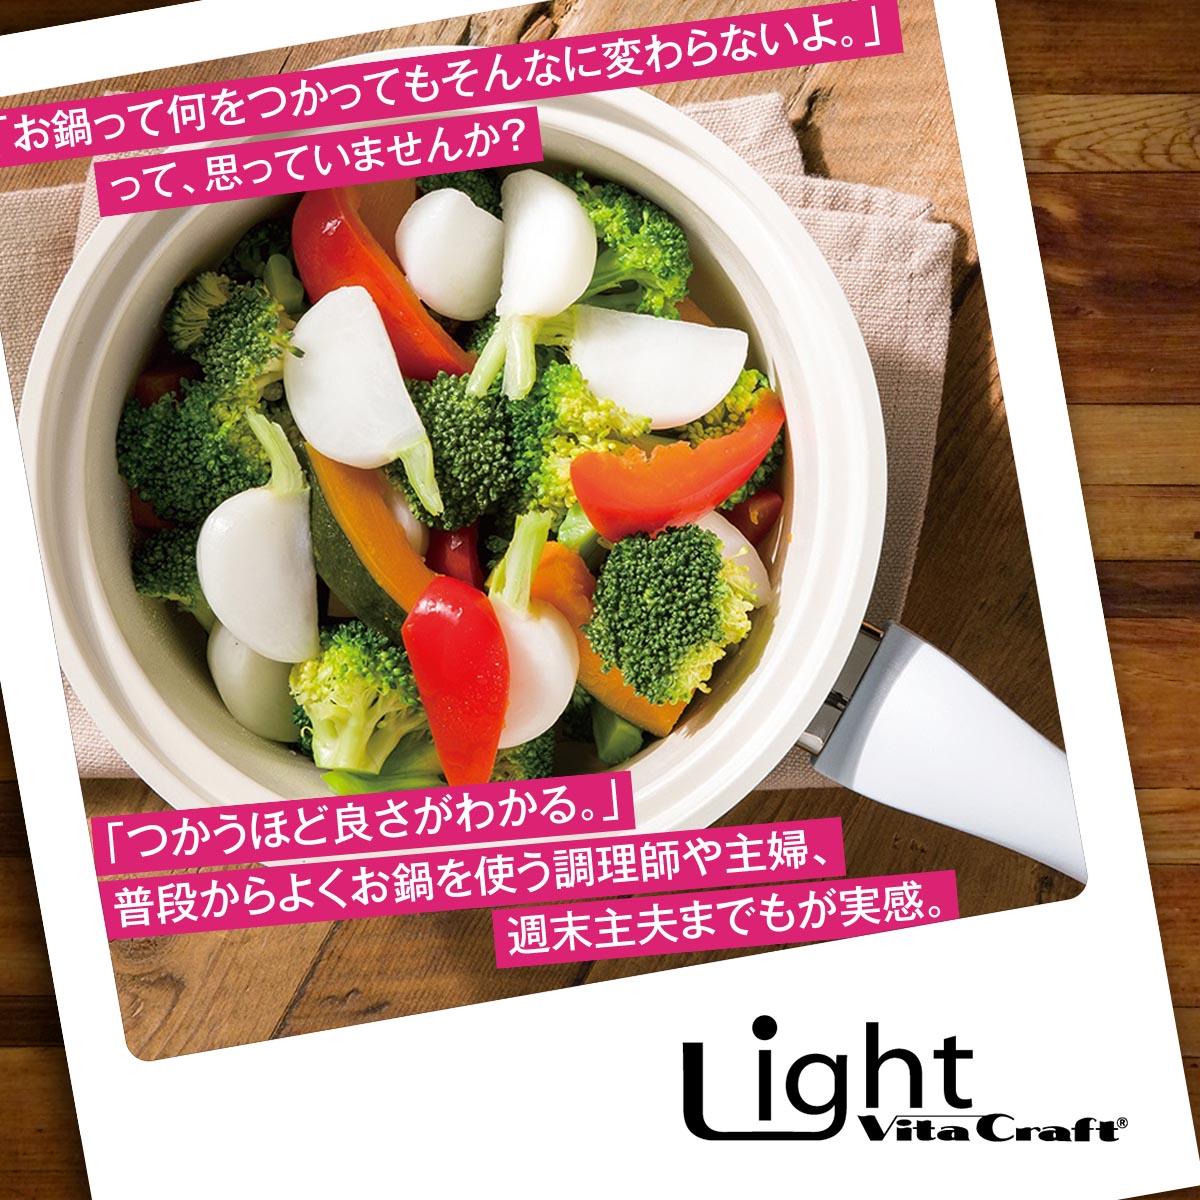 1.image.jpg